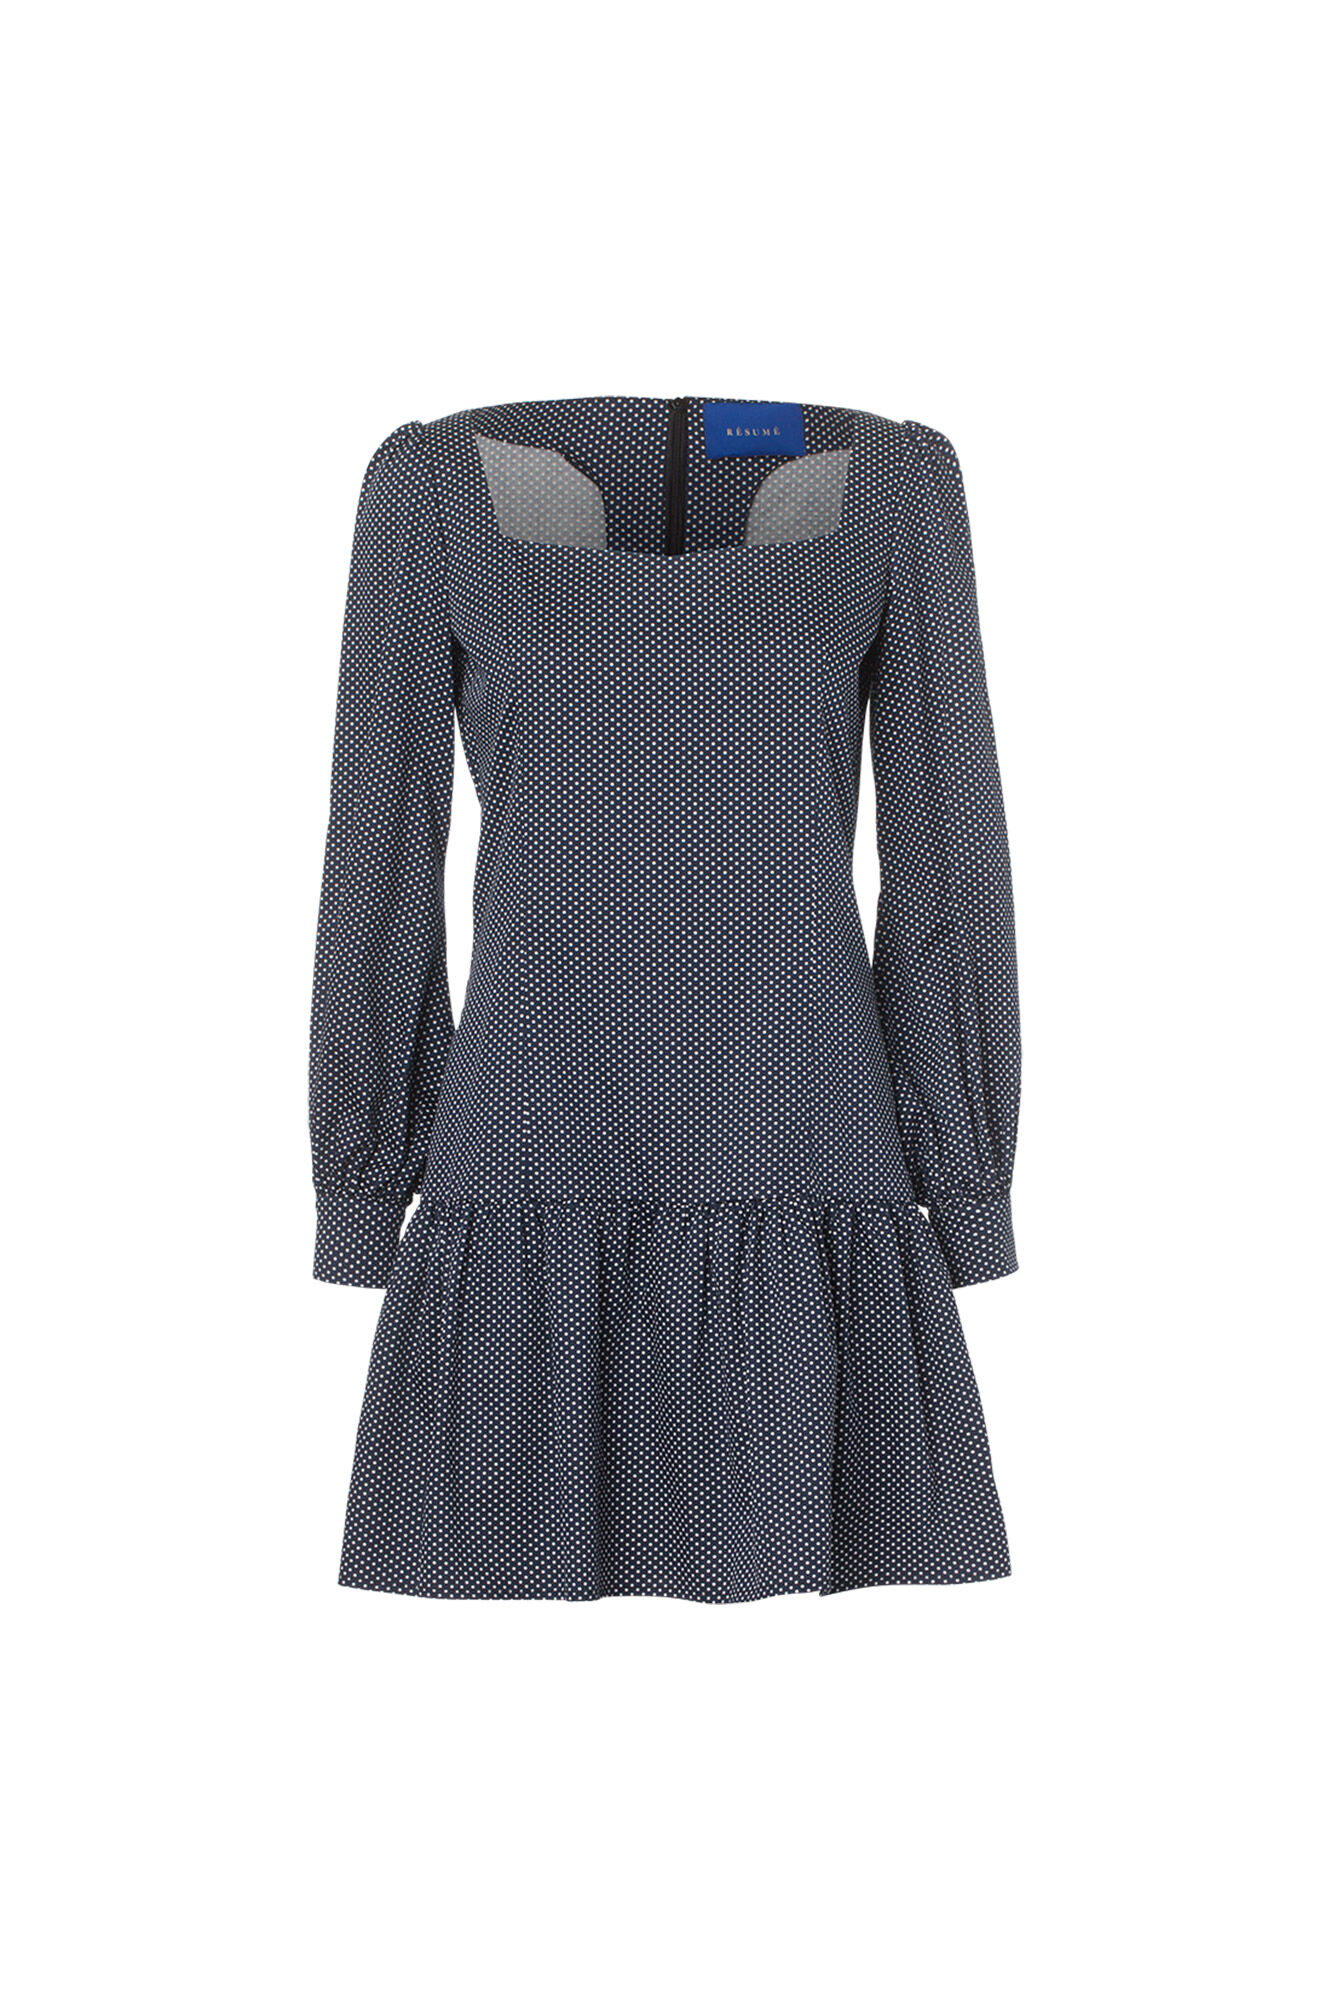 Montana Dress 04190233, NAVY